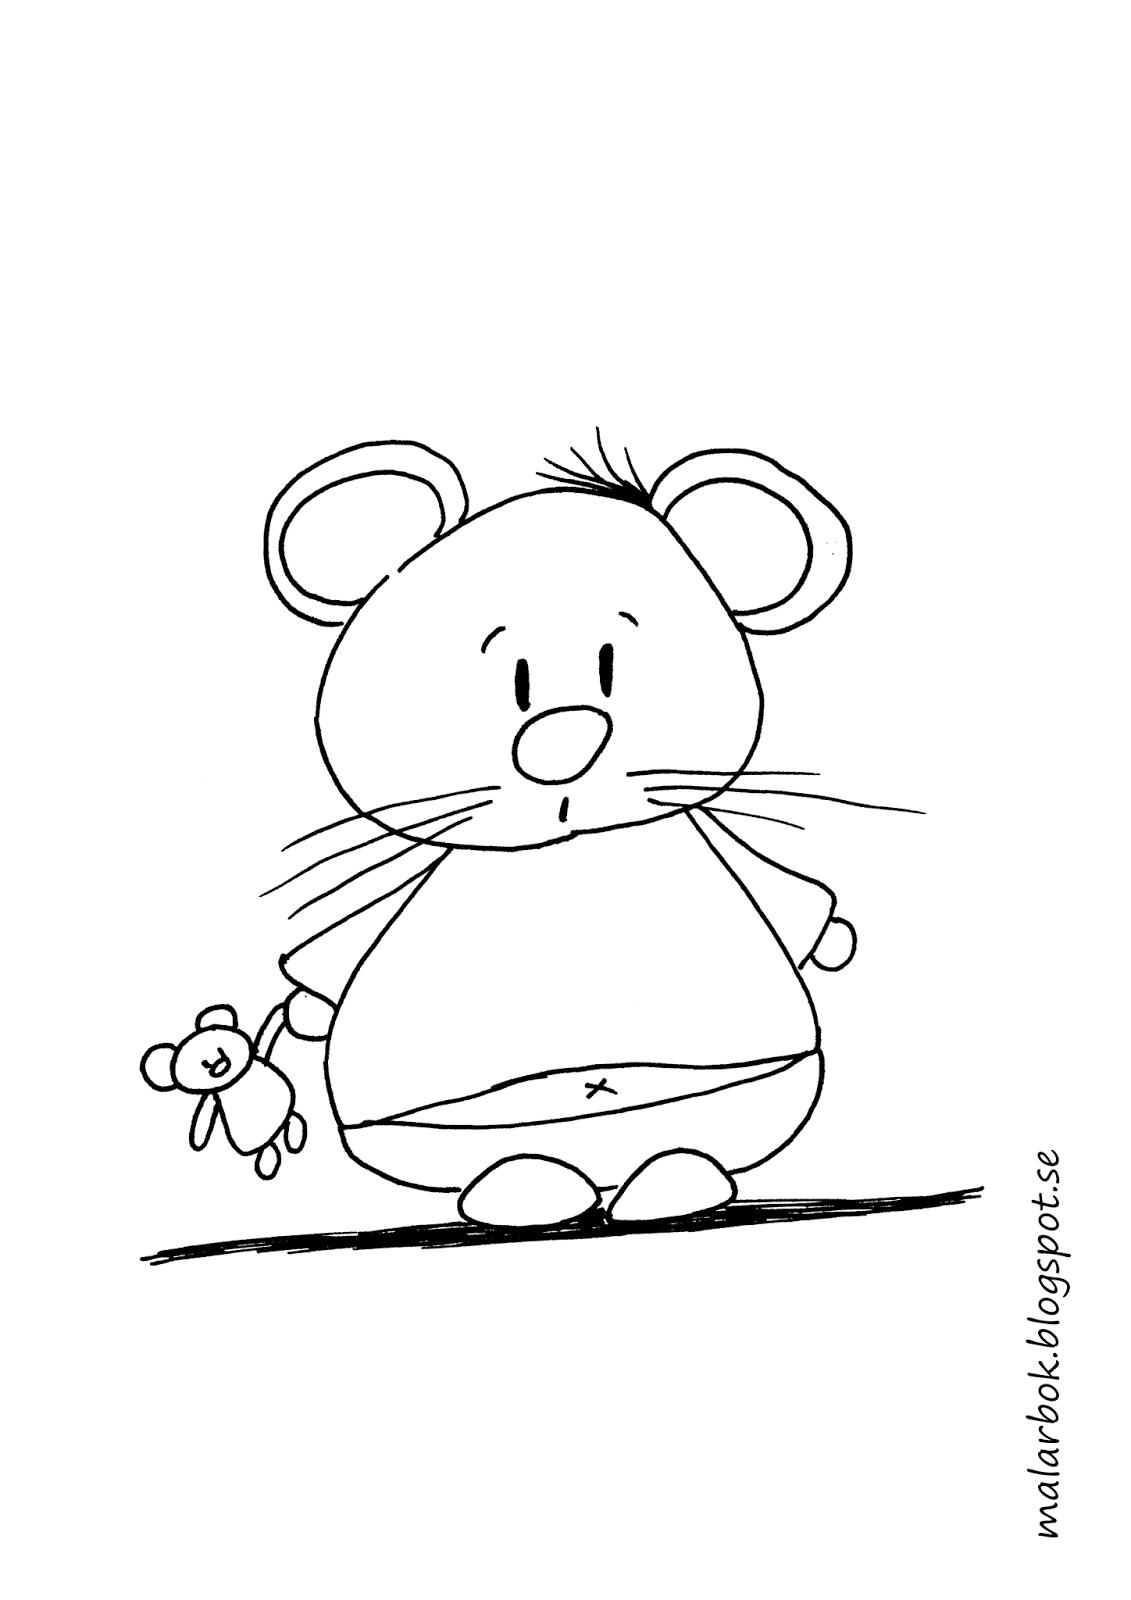 målarbild mus med nalle